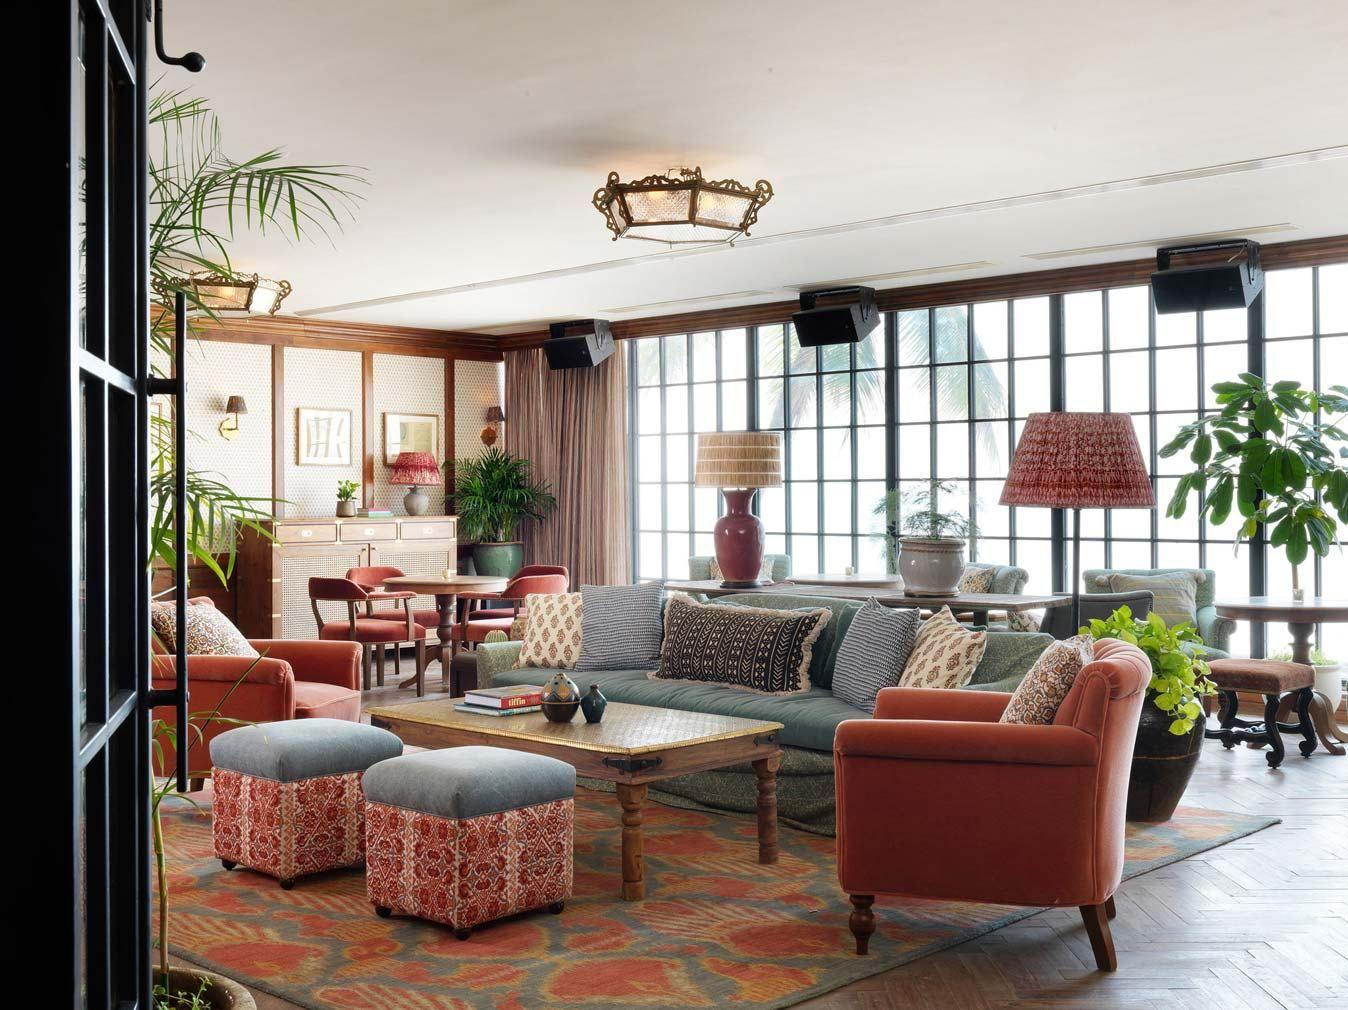 Soho House Opens Their First Location In Asia Mumbai Soho House Soho House Istanbul Home Living Room